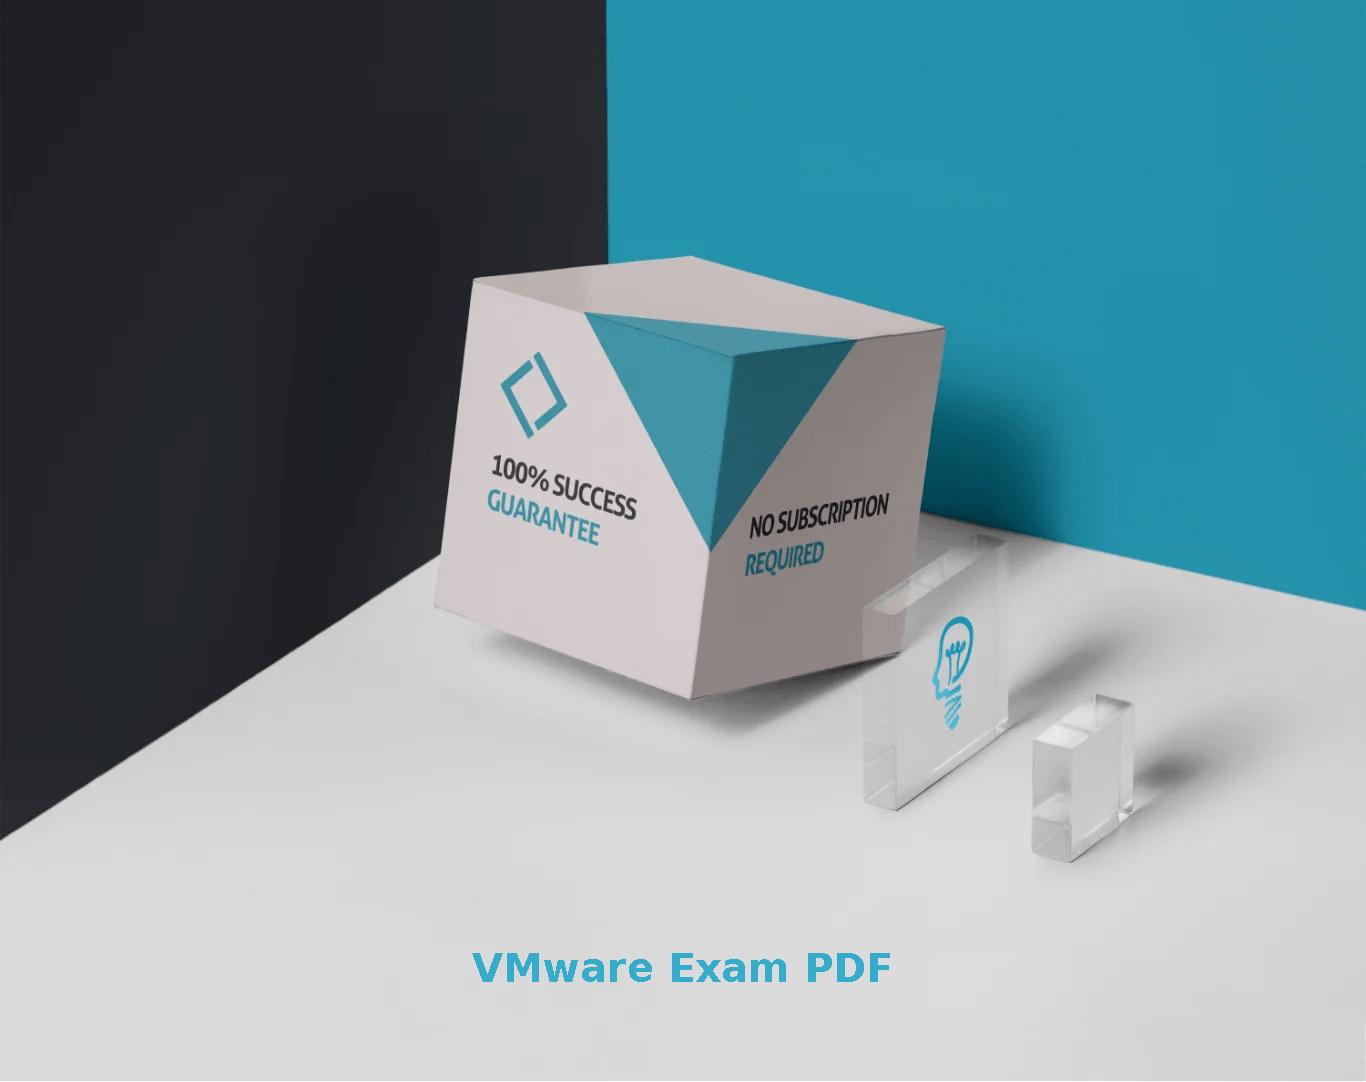 VMware Exam PDF